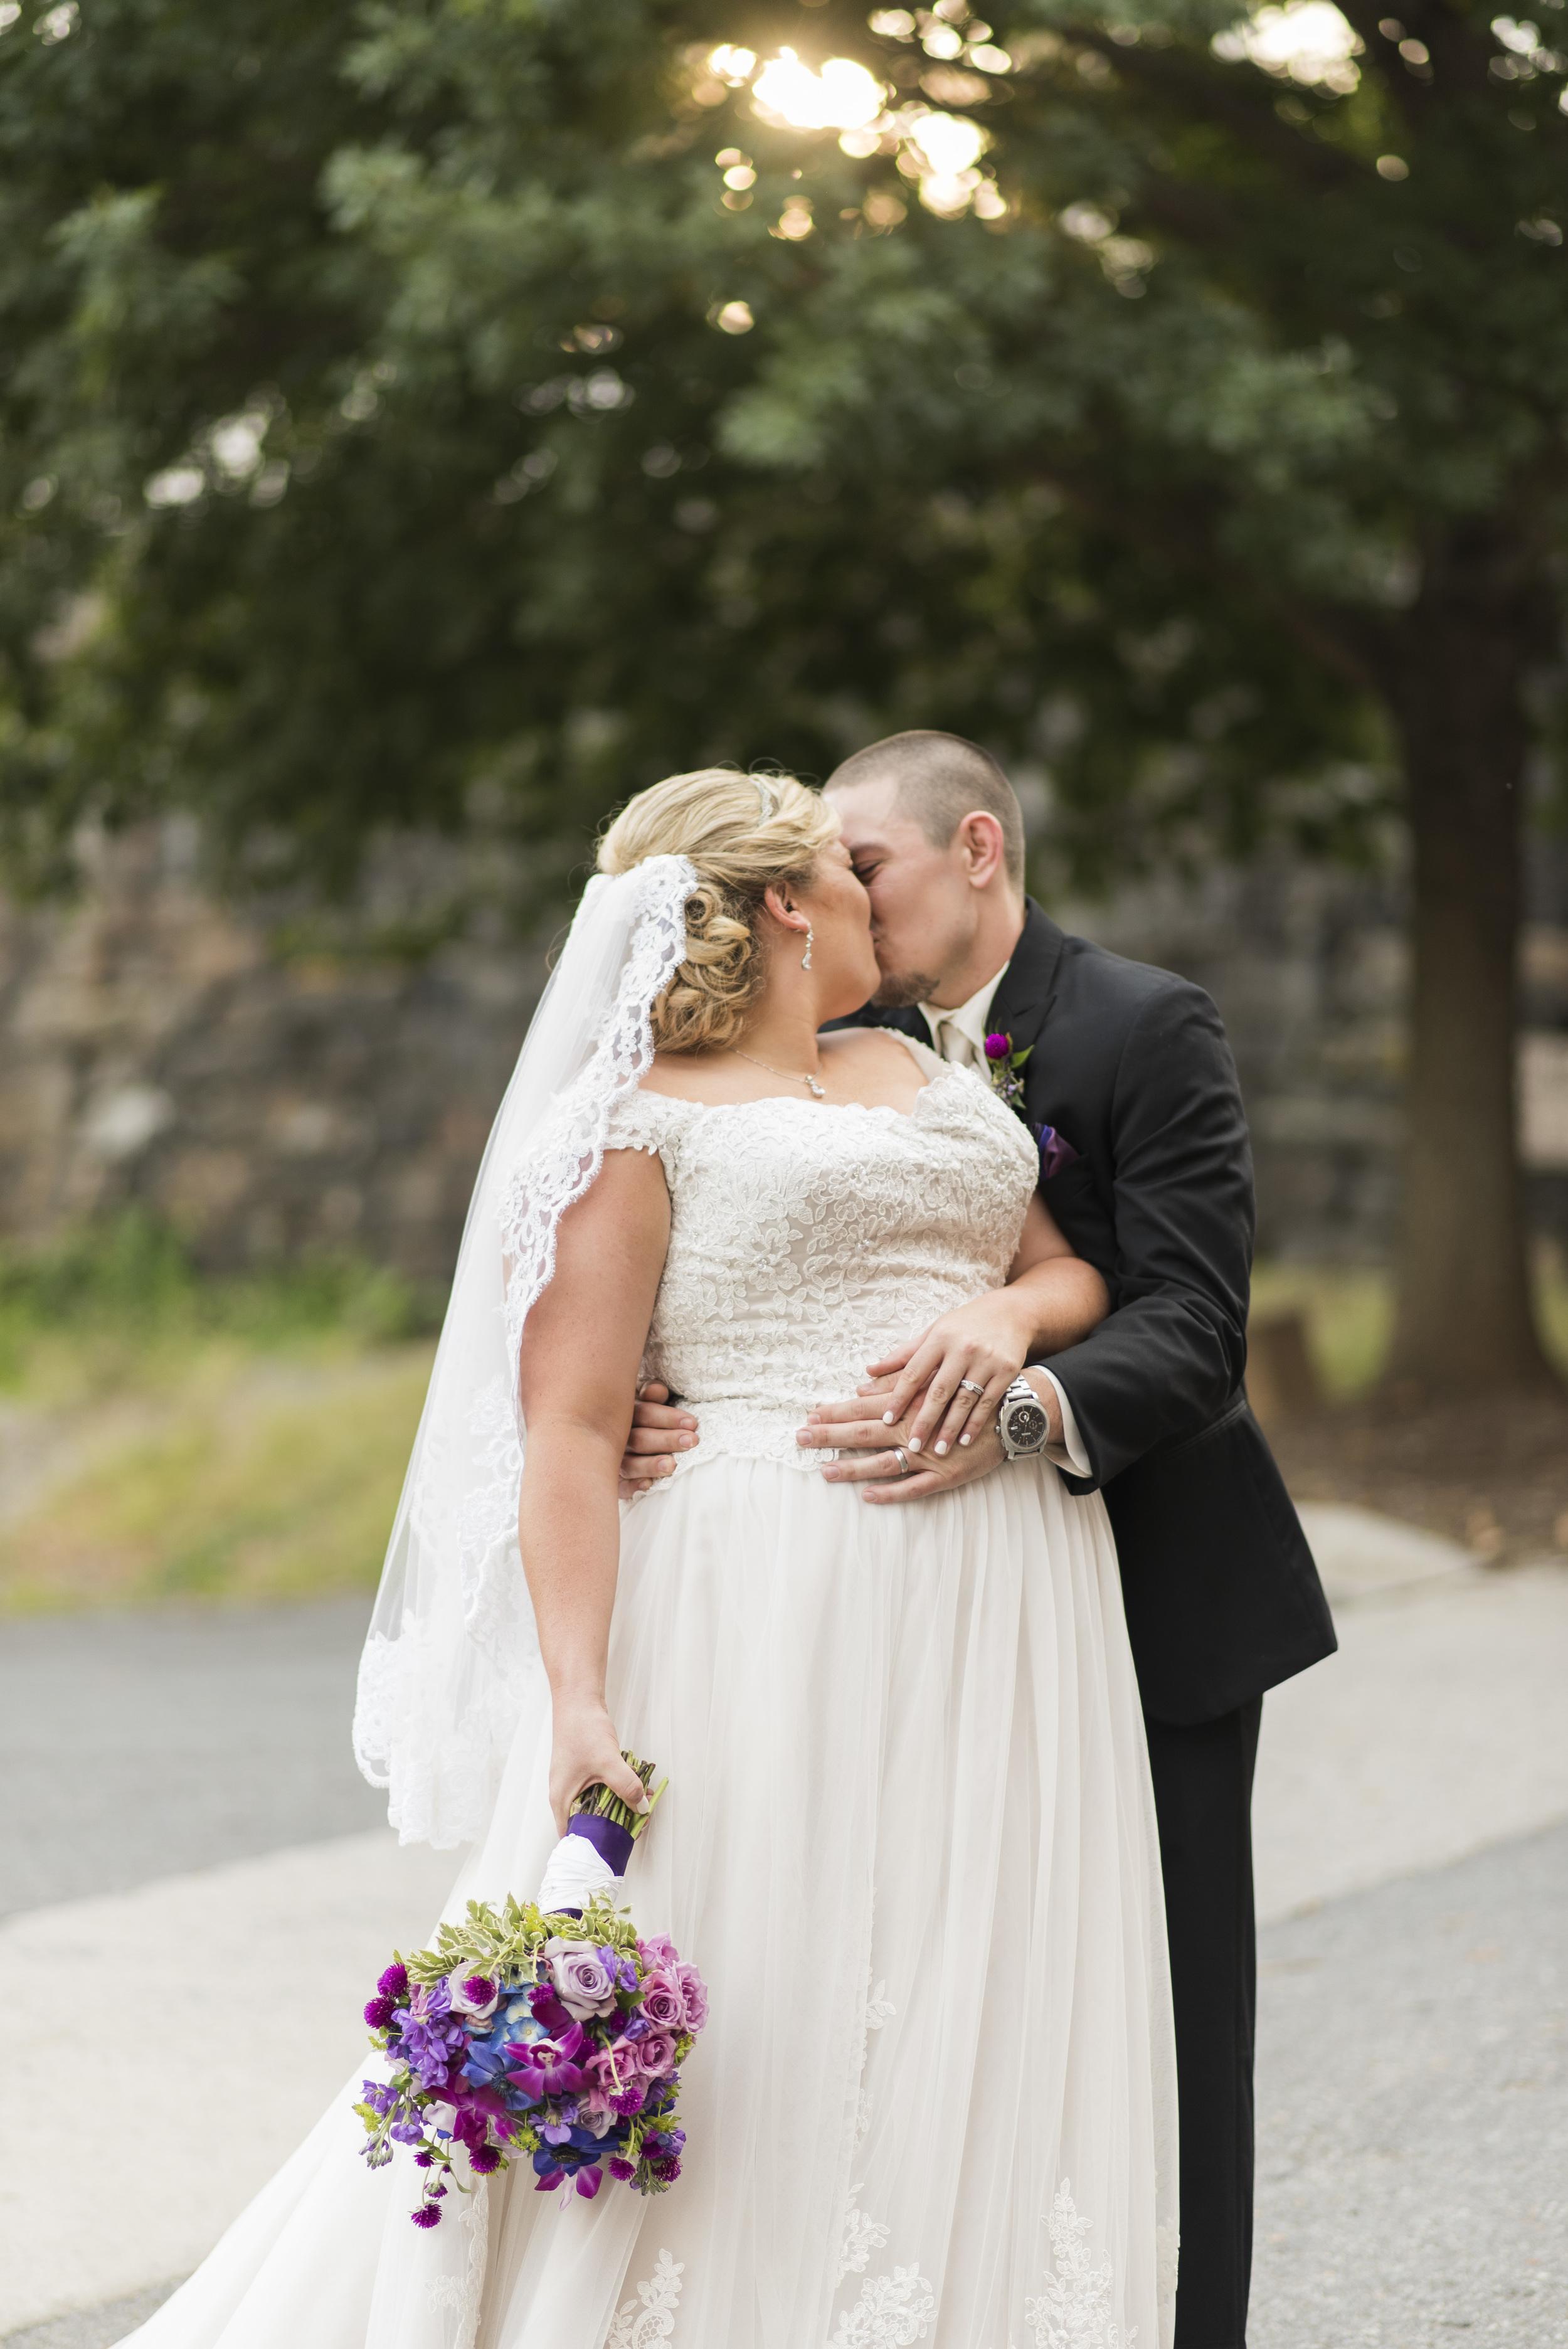 Lynchburg_VA_Wedding_Tresca on 8th_Downtown_Purple_elegant_Photos899.jpg